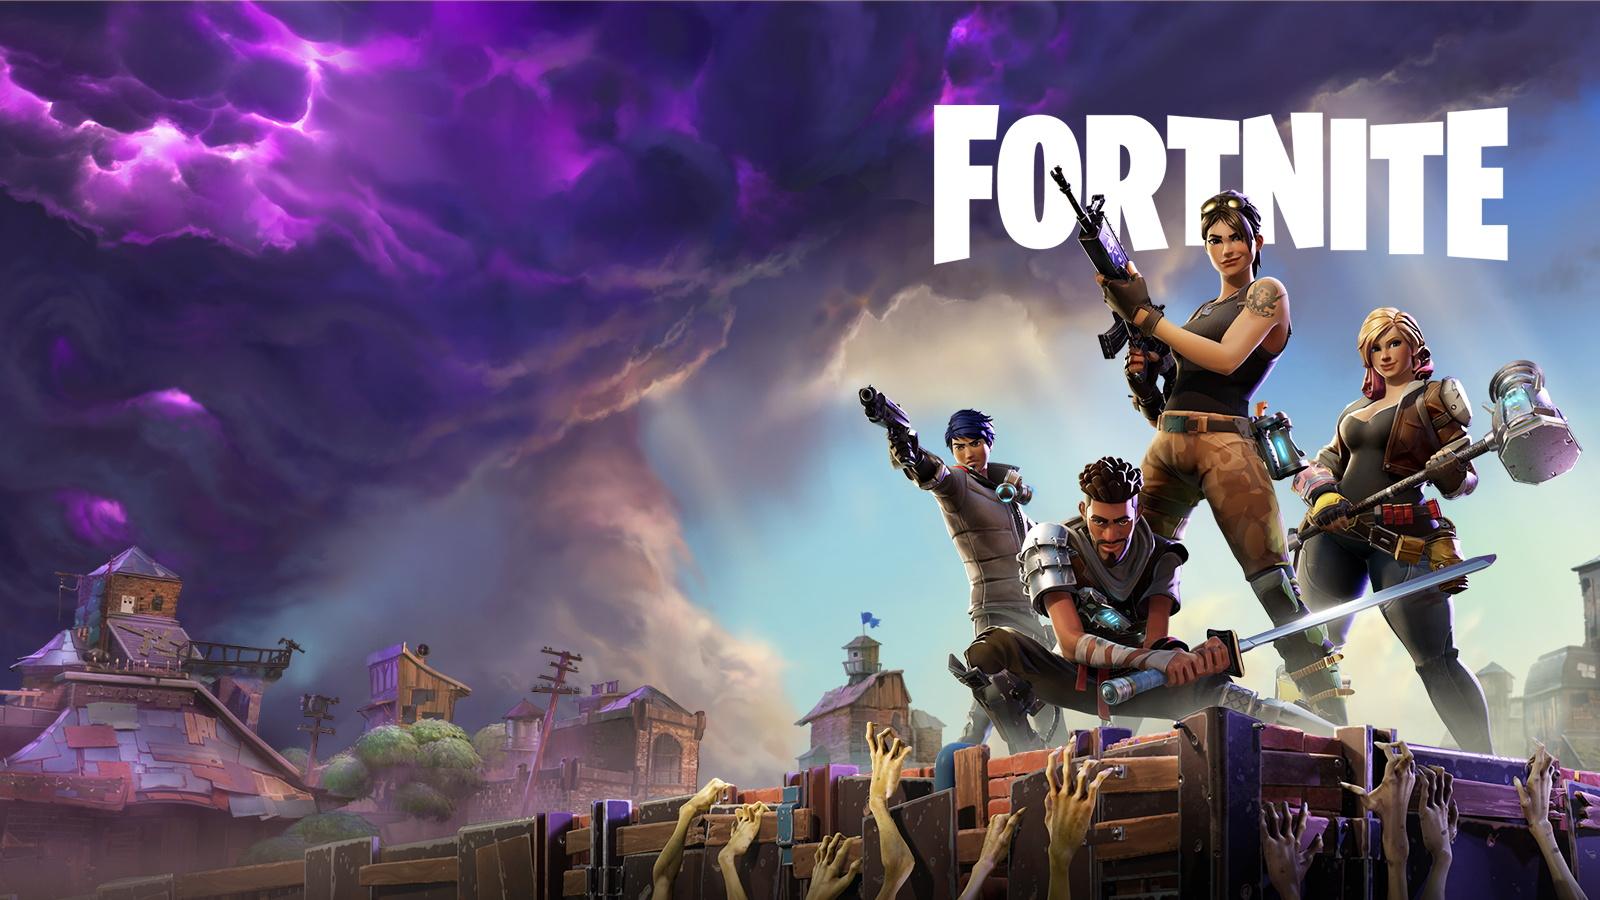 5 Best VPN for Fortnite in 2019 - Improve Your Gaming